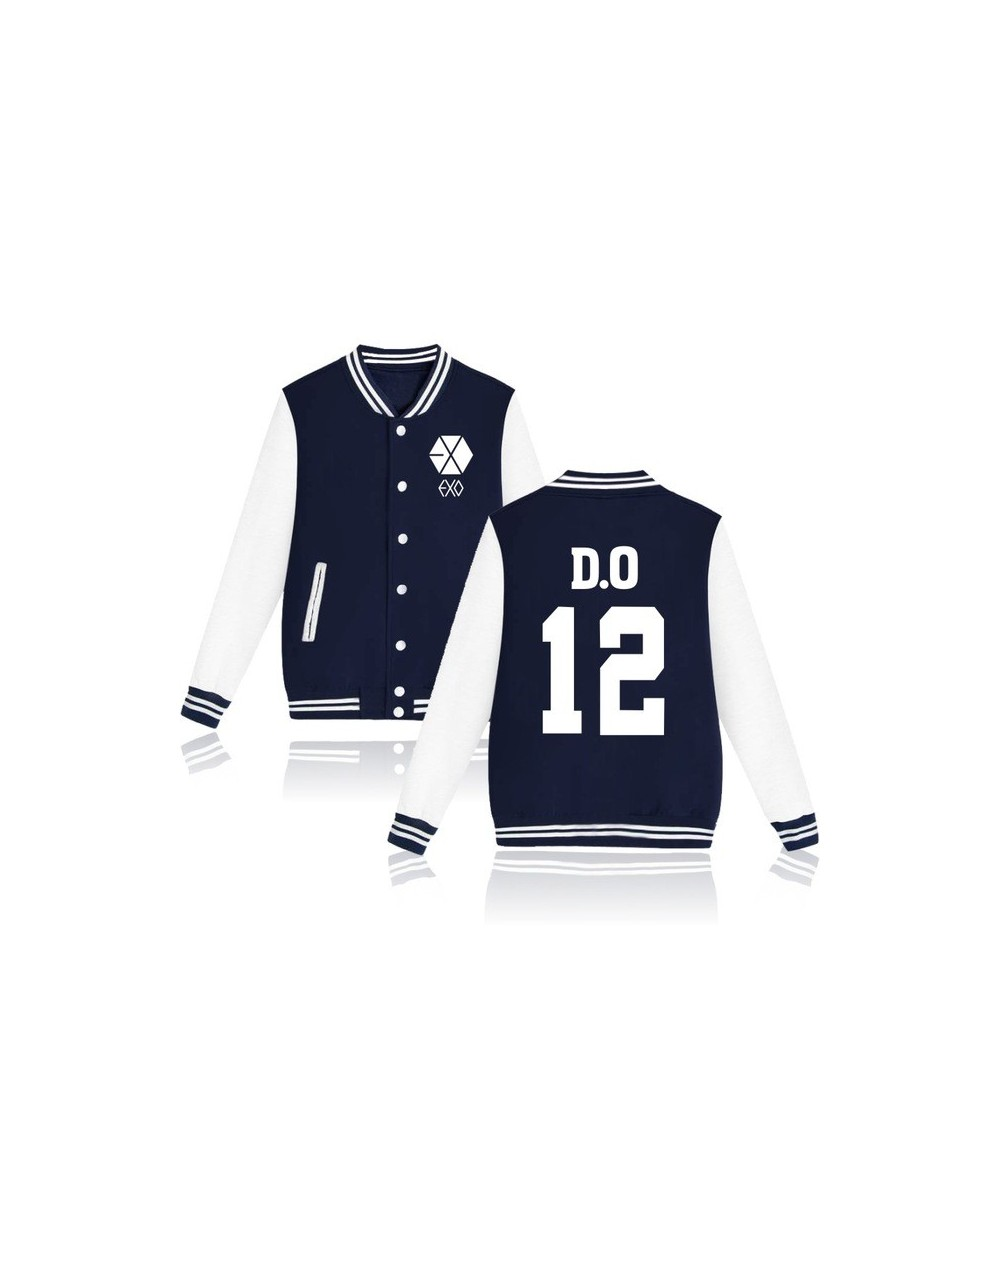 2017 EXO Kpop jaquetas feminino casaco Printed Hoodies bomber jacket baseball jacket Men/Women Tracksuit Jacket - DO 12 Navy...